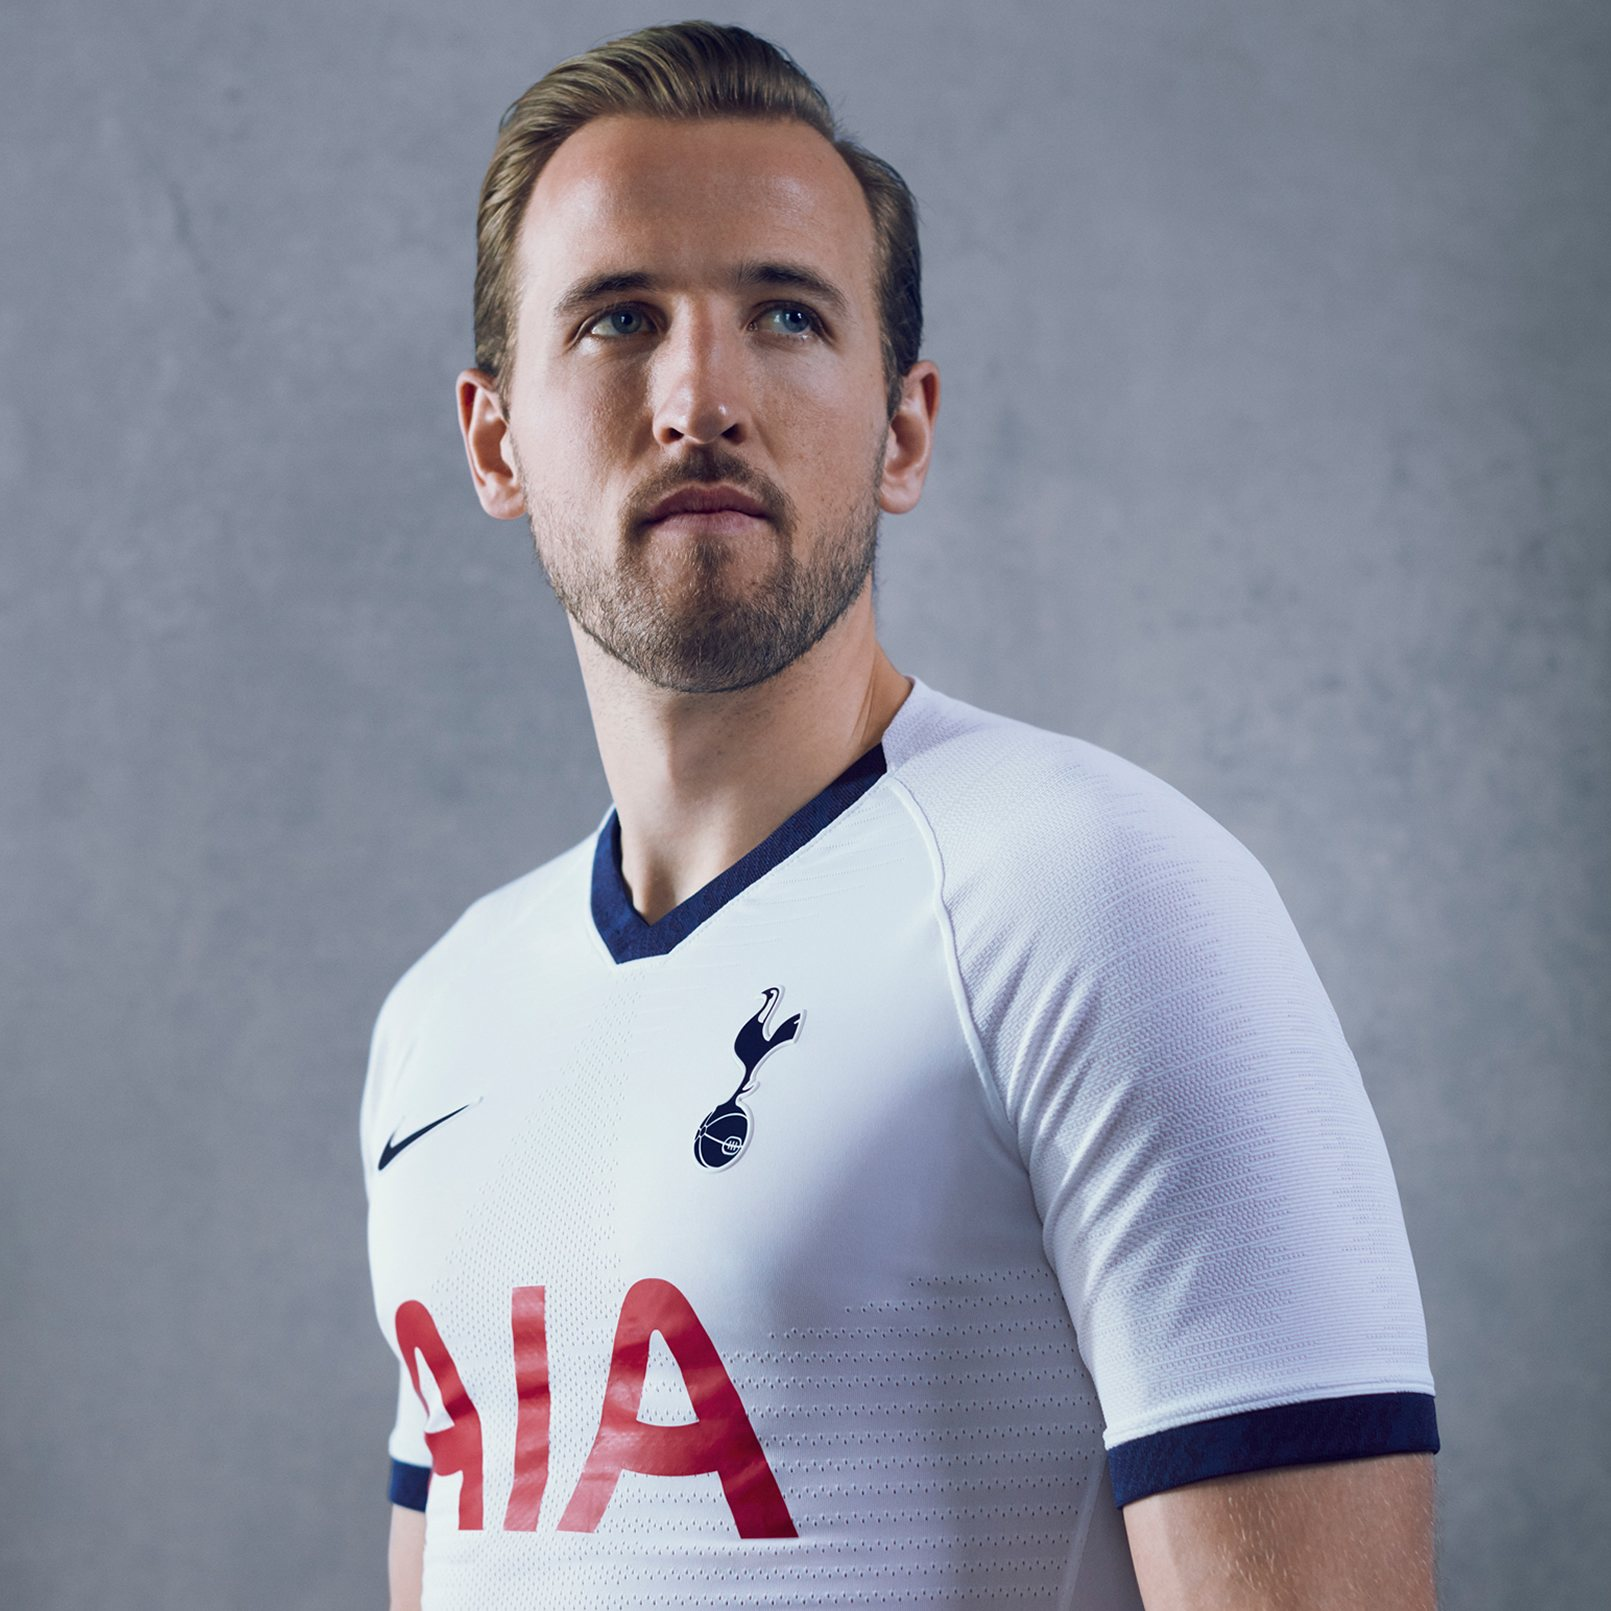 Camiseta titular del Tottenham 2019/2020 | Imagen Nike